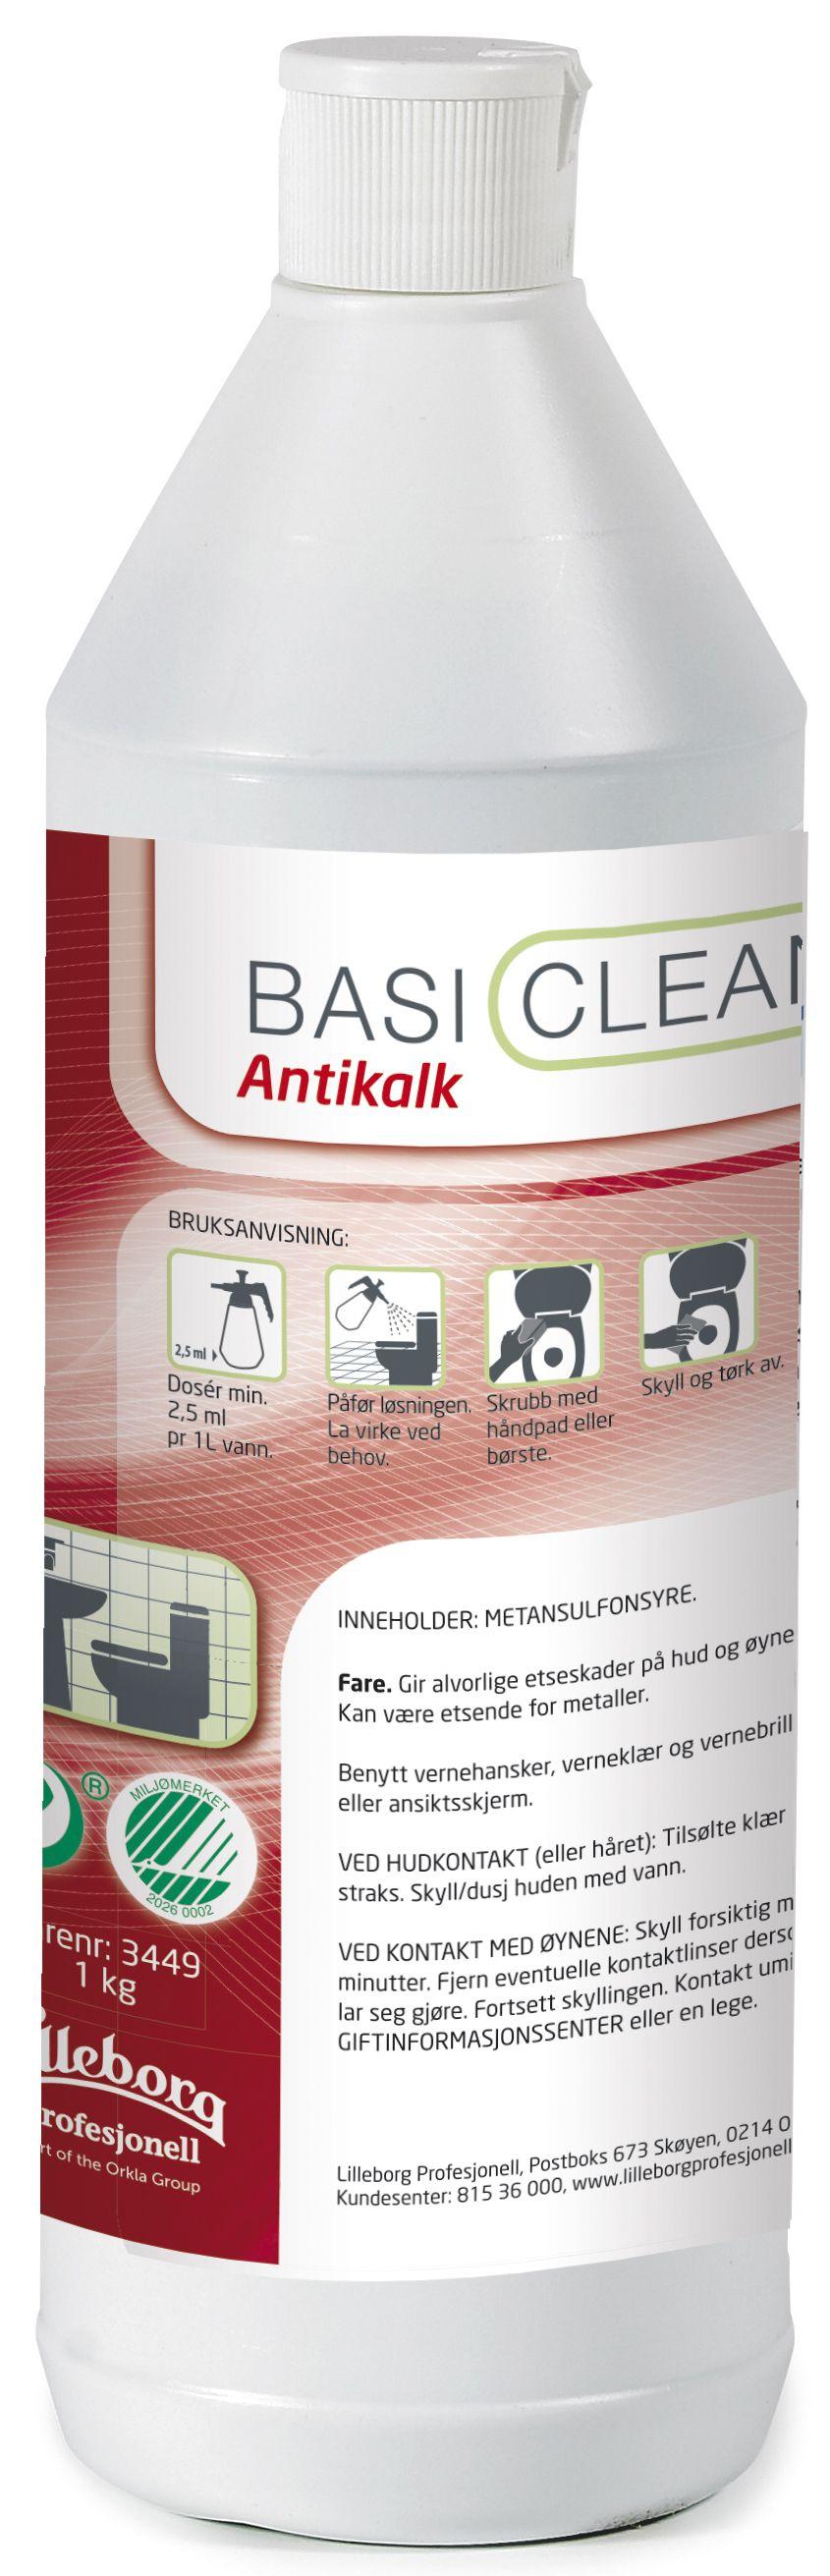 Basiclean Rengjøring antikalk 1L Y462299